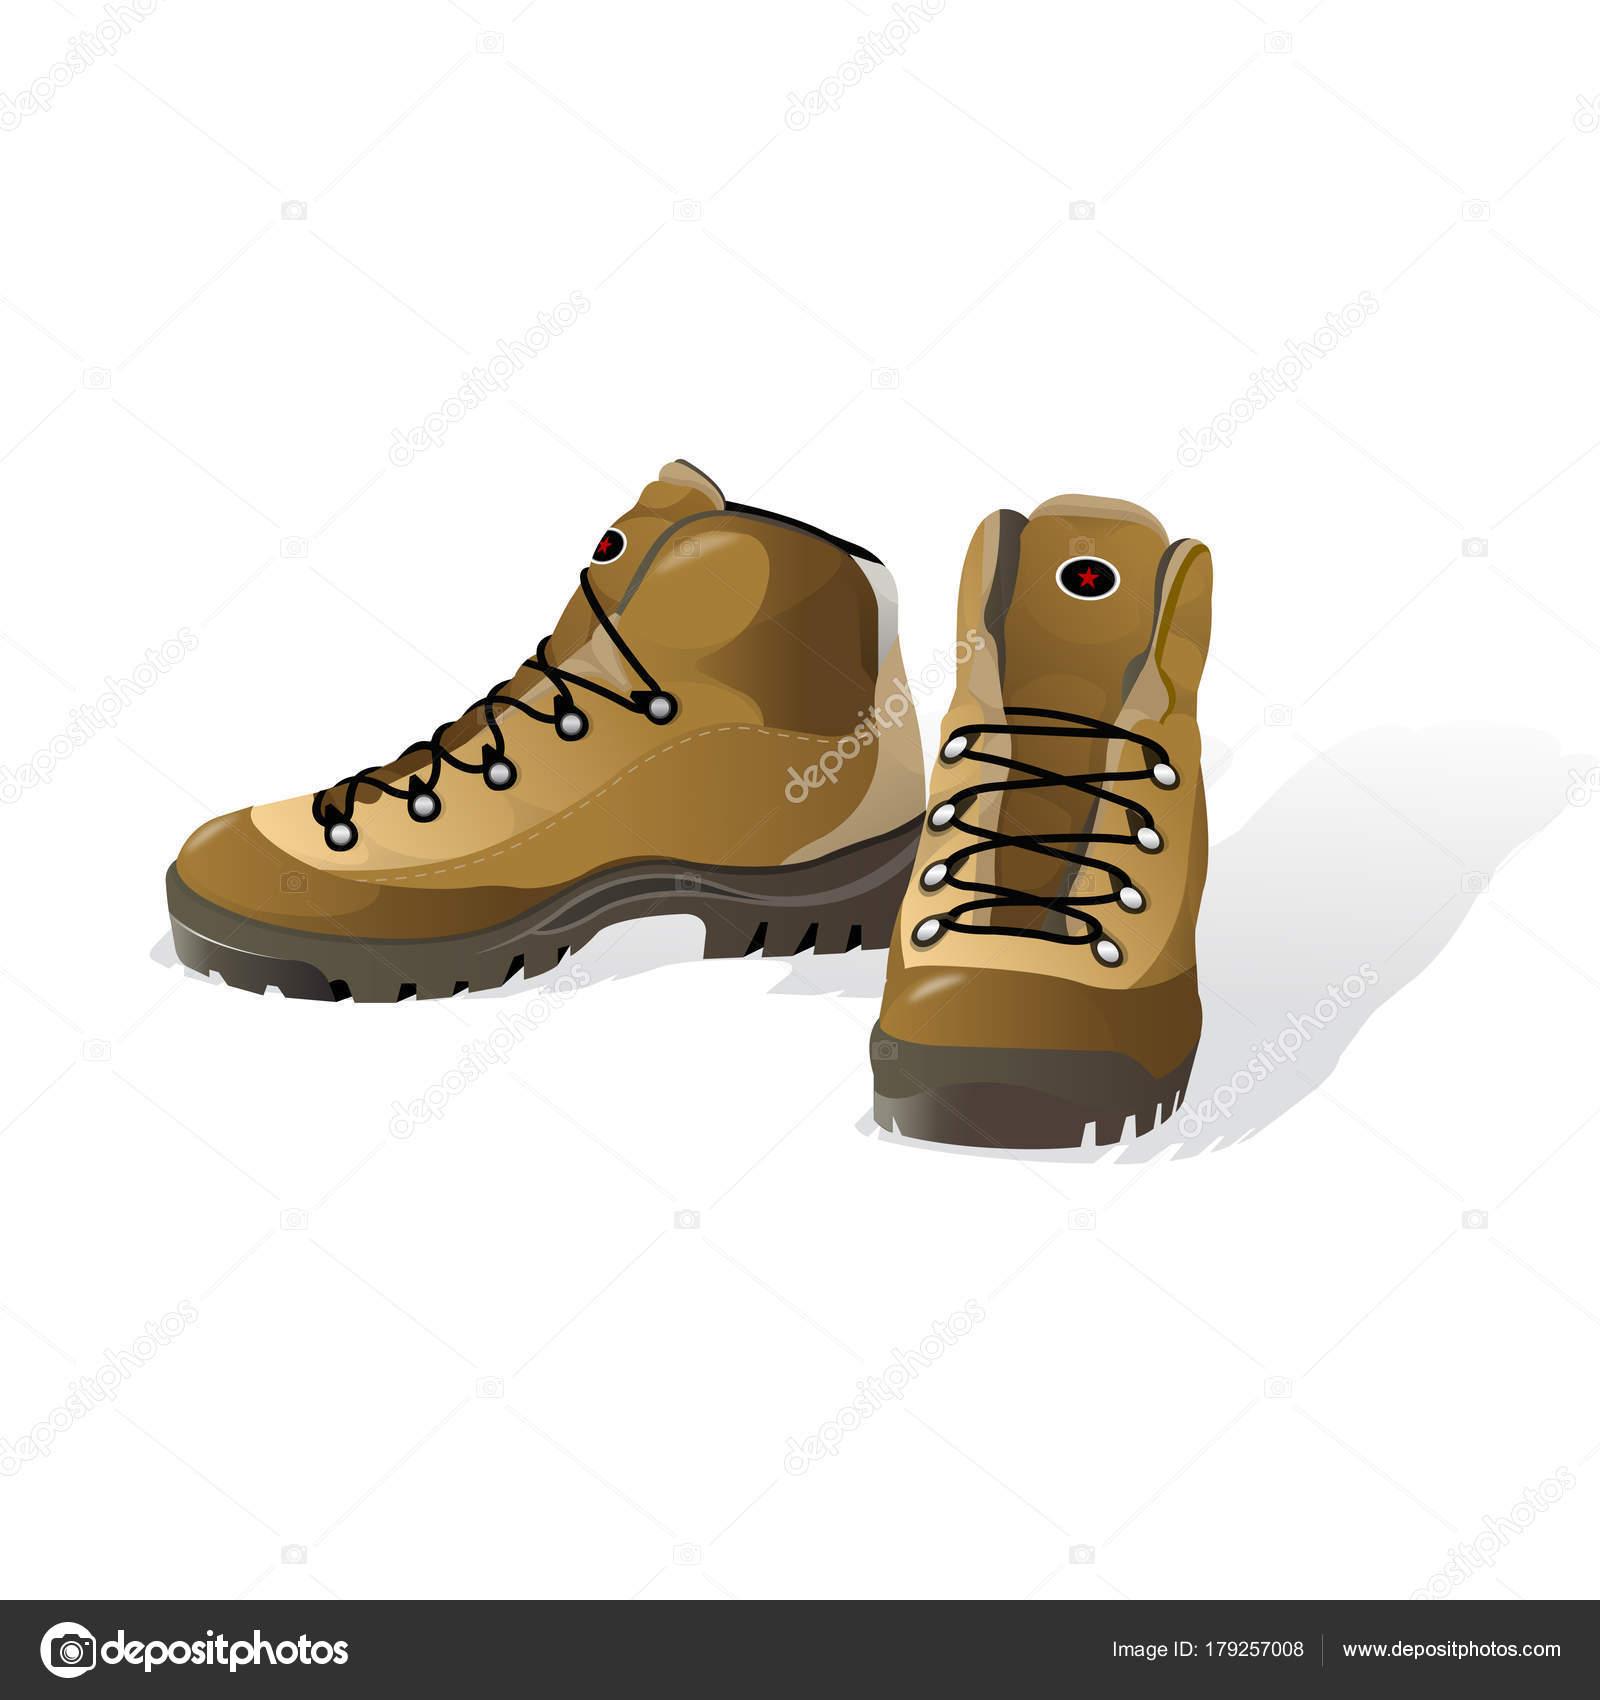 f4c13aa2ed3 Πεζοπορία παπούτσια, ορειβατικά μποτάκια, εικονογράφηση διάνυσμα ...